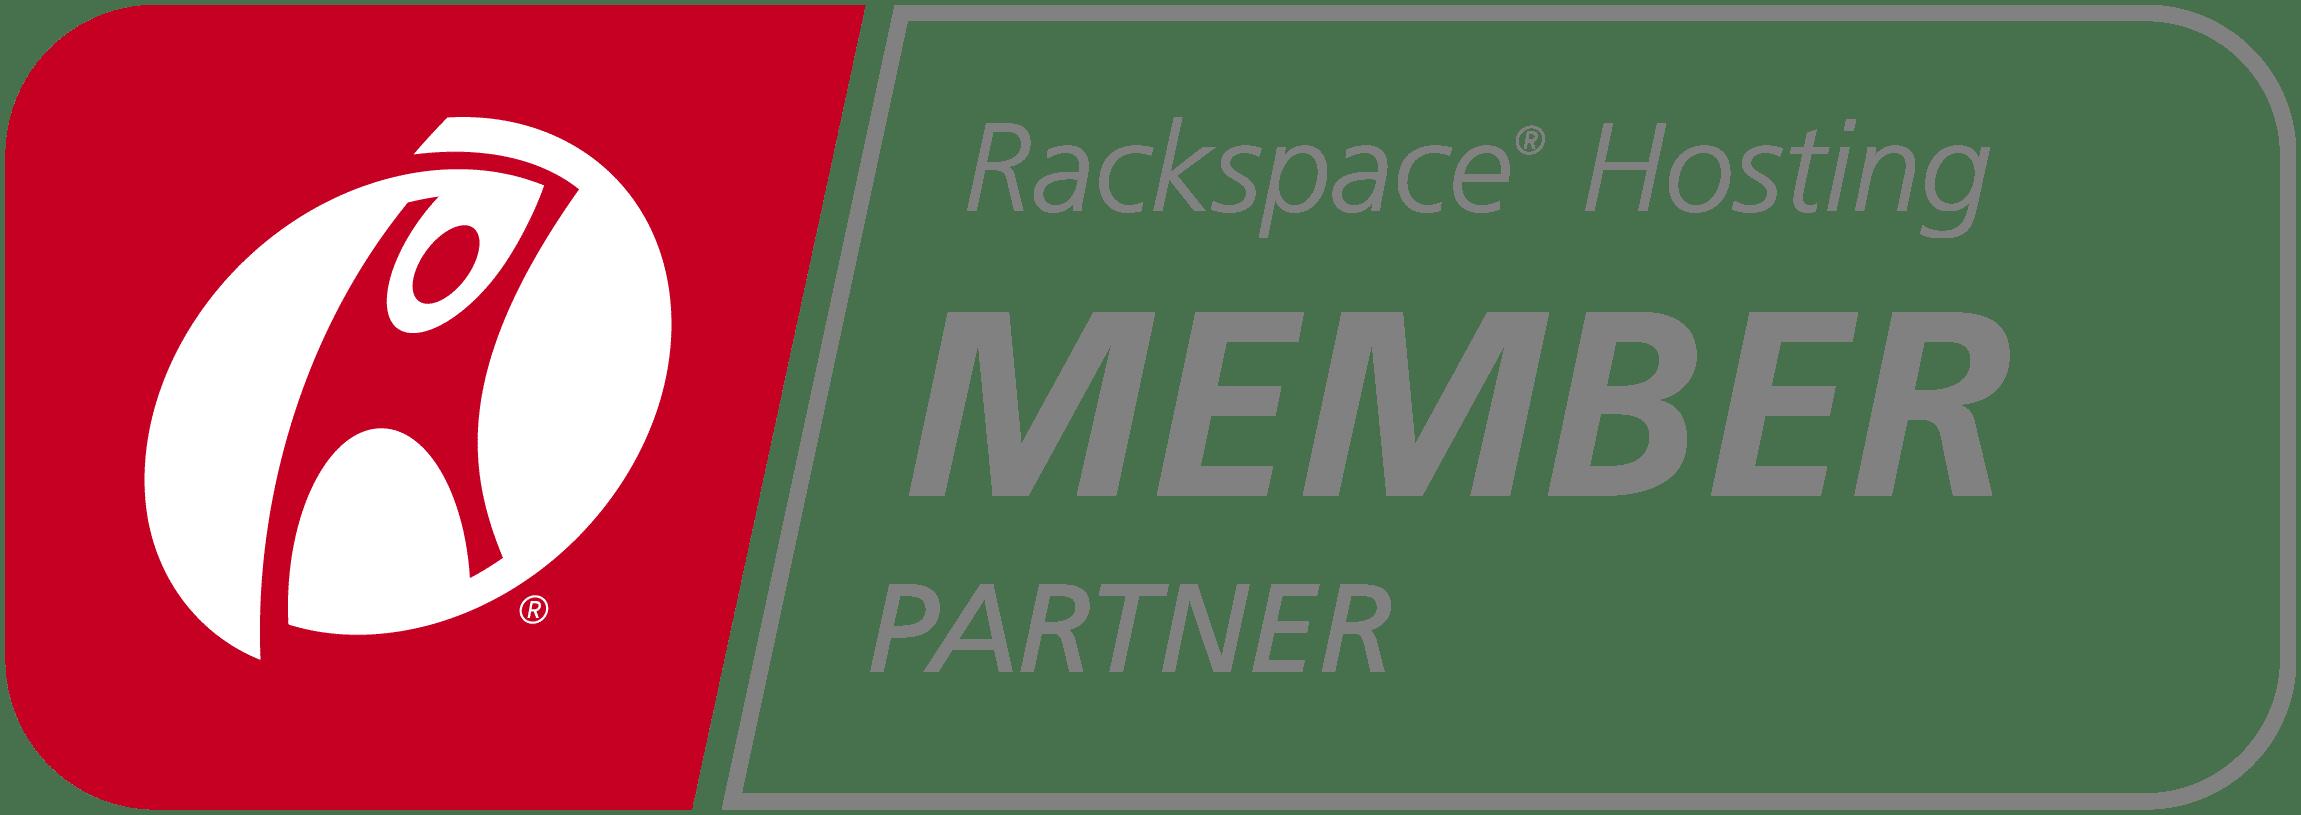 rackspace hosting axxiem biotech website design